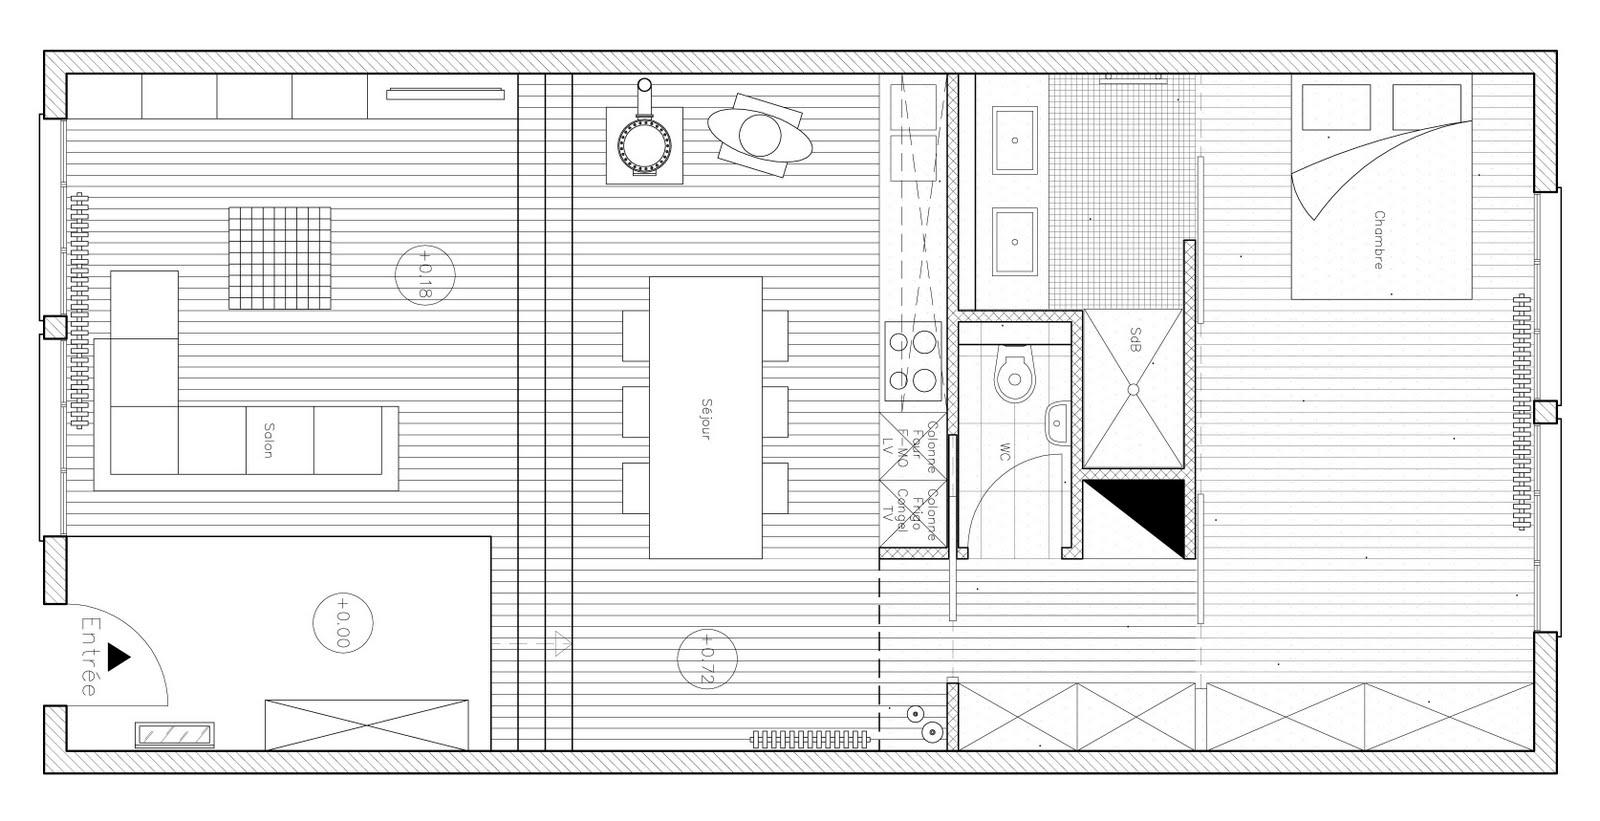 #0E0E0E Nicolas Lozano Architecte D'intérieur Pau (64  4971 plan piece a vivre 30m2 1600x821 px @ aertt.com